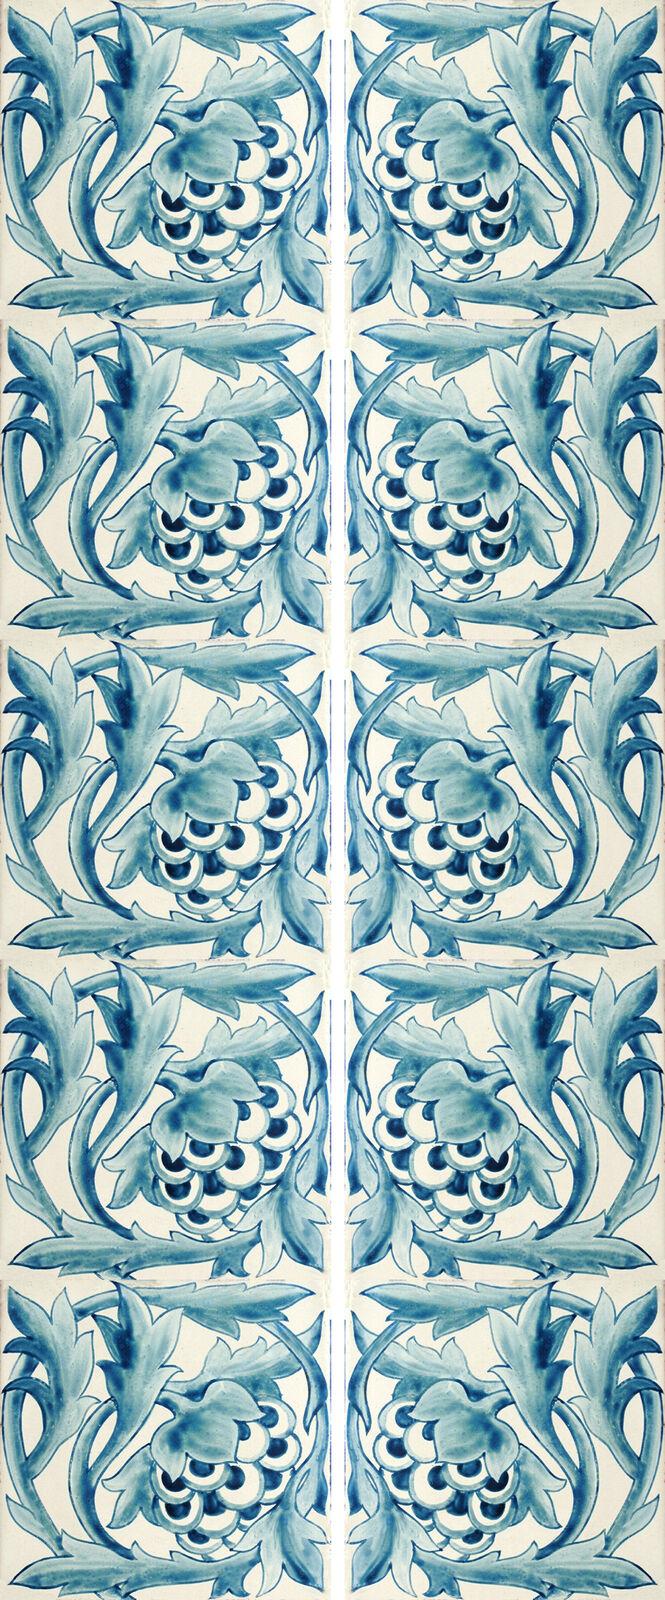 William Morris Artichoke Fireplace Tile Set